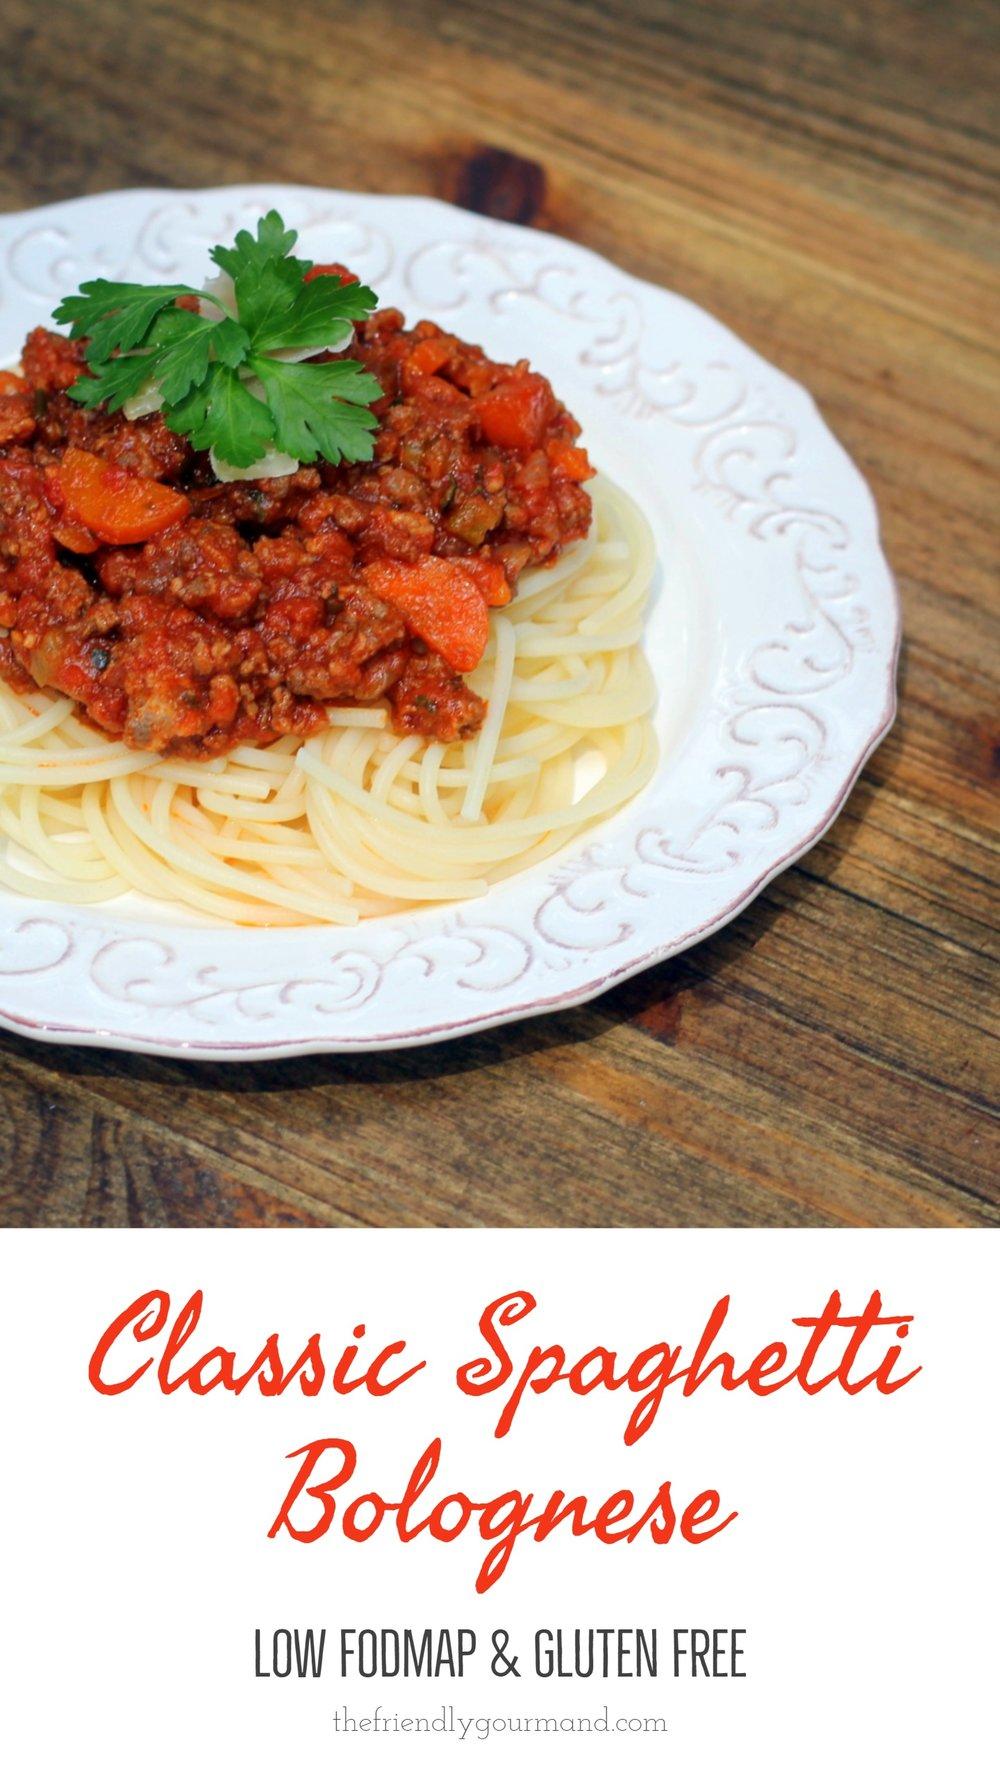 Classic Spaghetti Bolognese - Low FODMAP & Gluten Free - The Friendly Gourmand - long pin.jpg